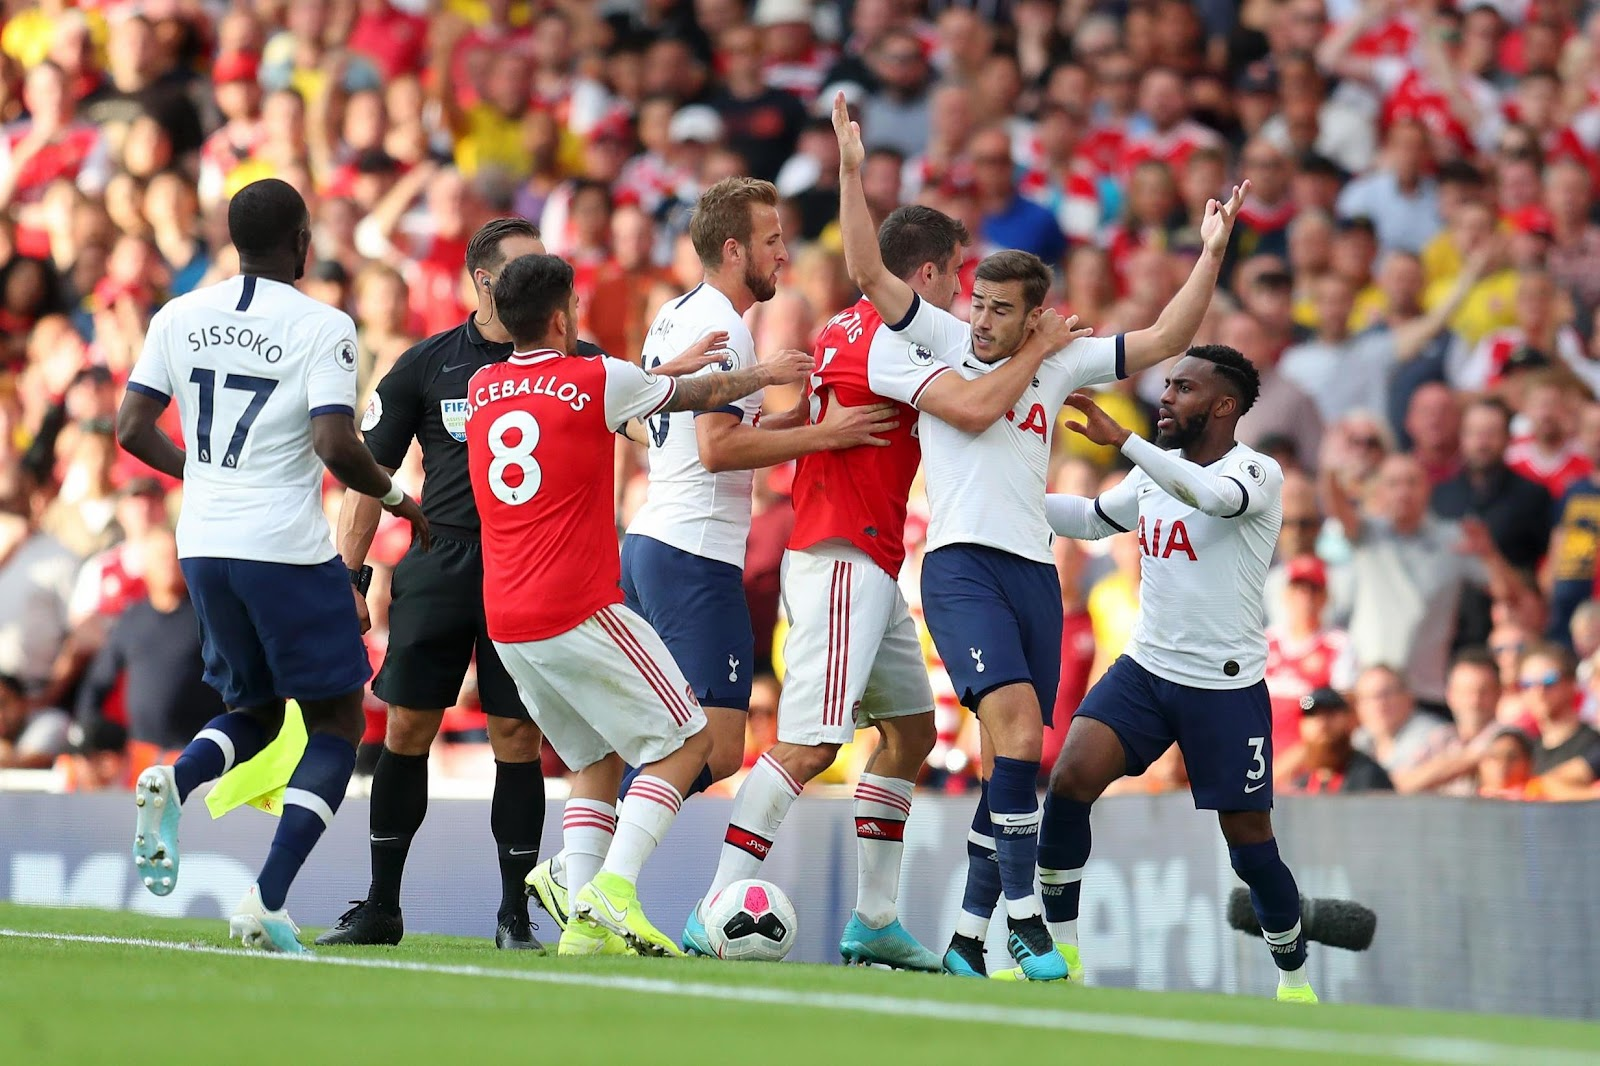 Арсенал - Тоттенхэм 2:2 • 01.09.2019